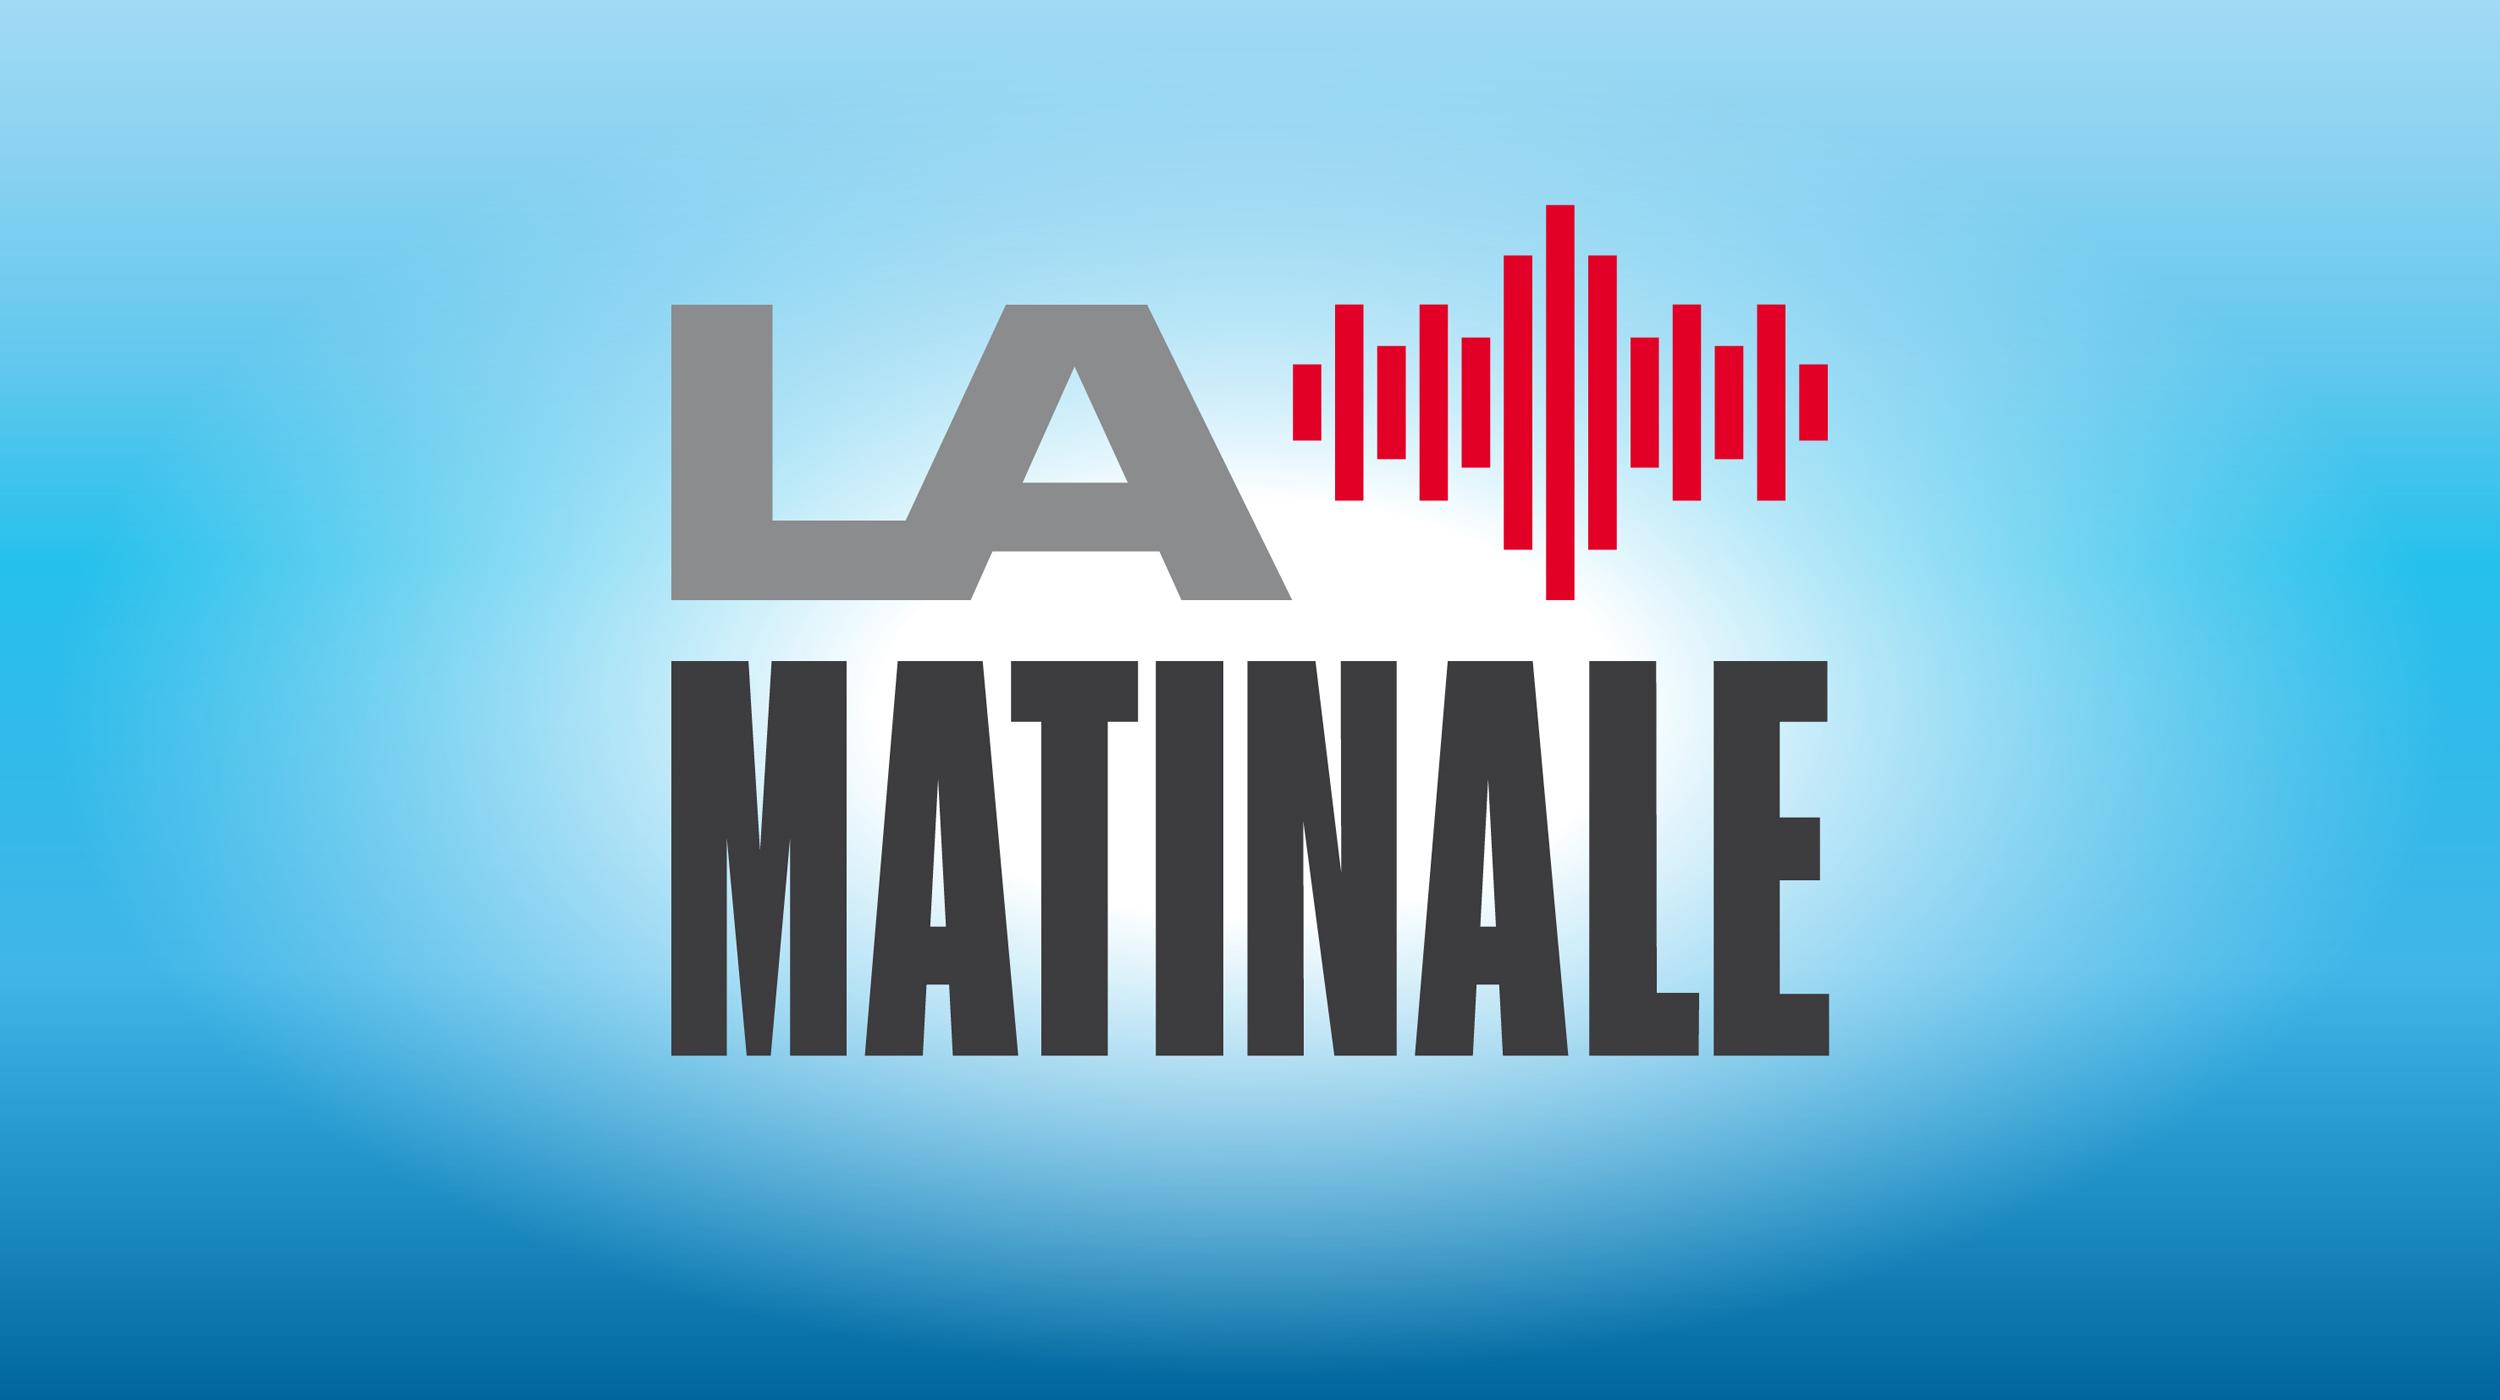 LOGO Matinale logo 2500x1400 [RTS]